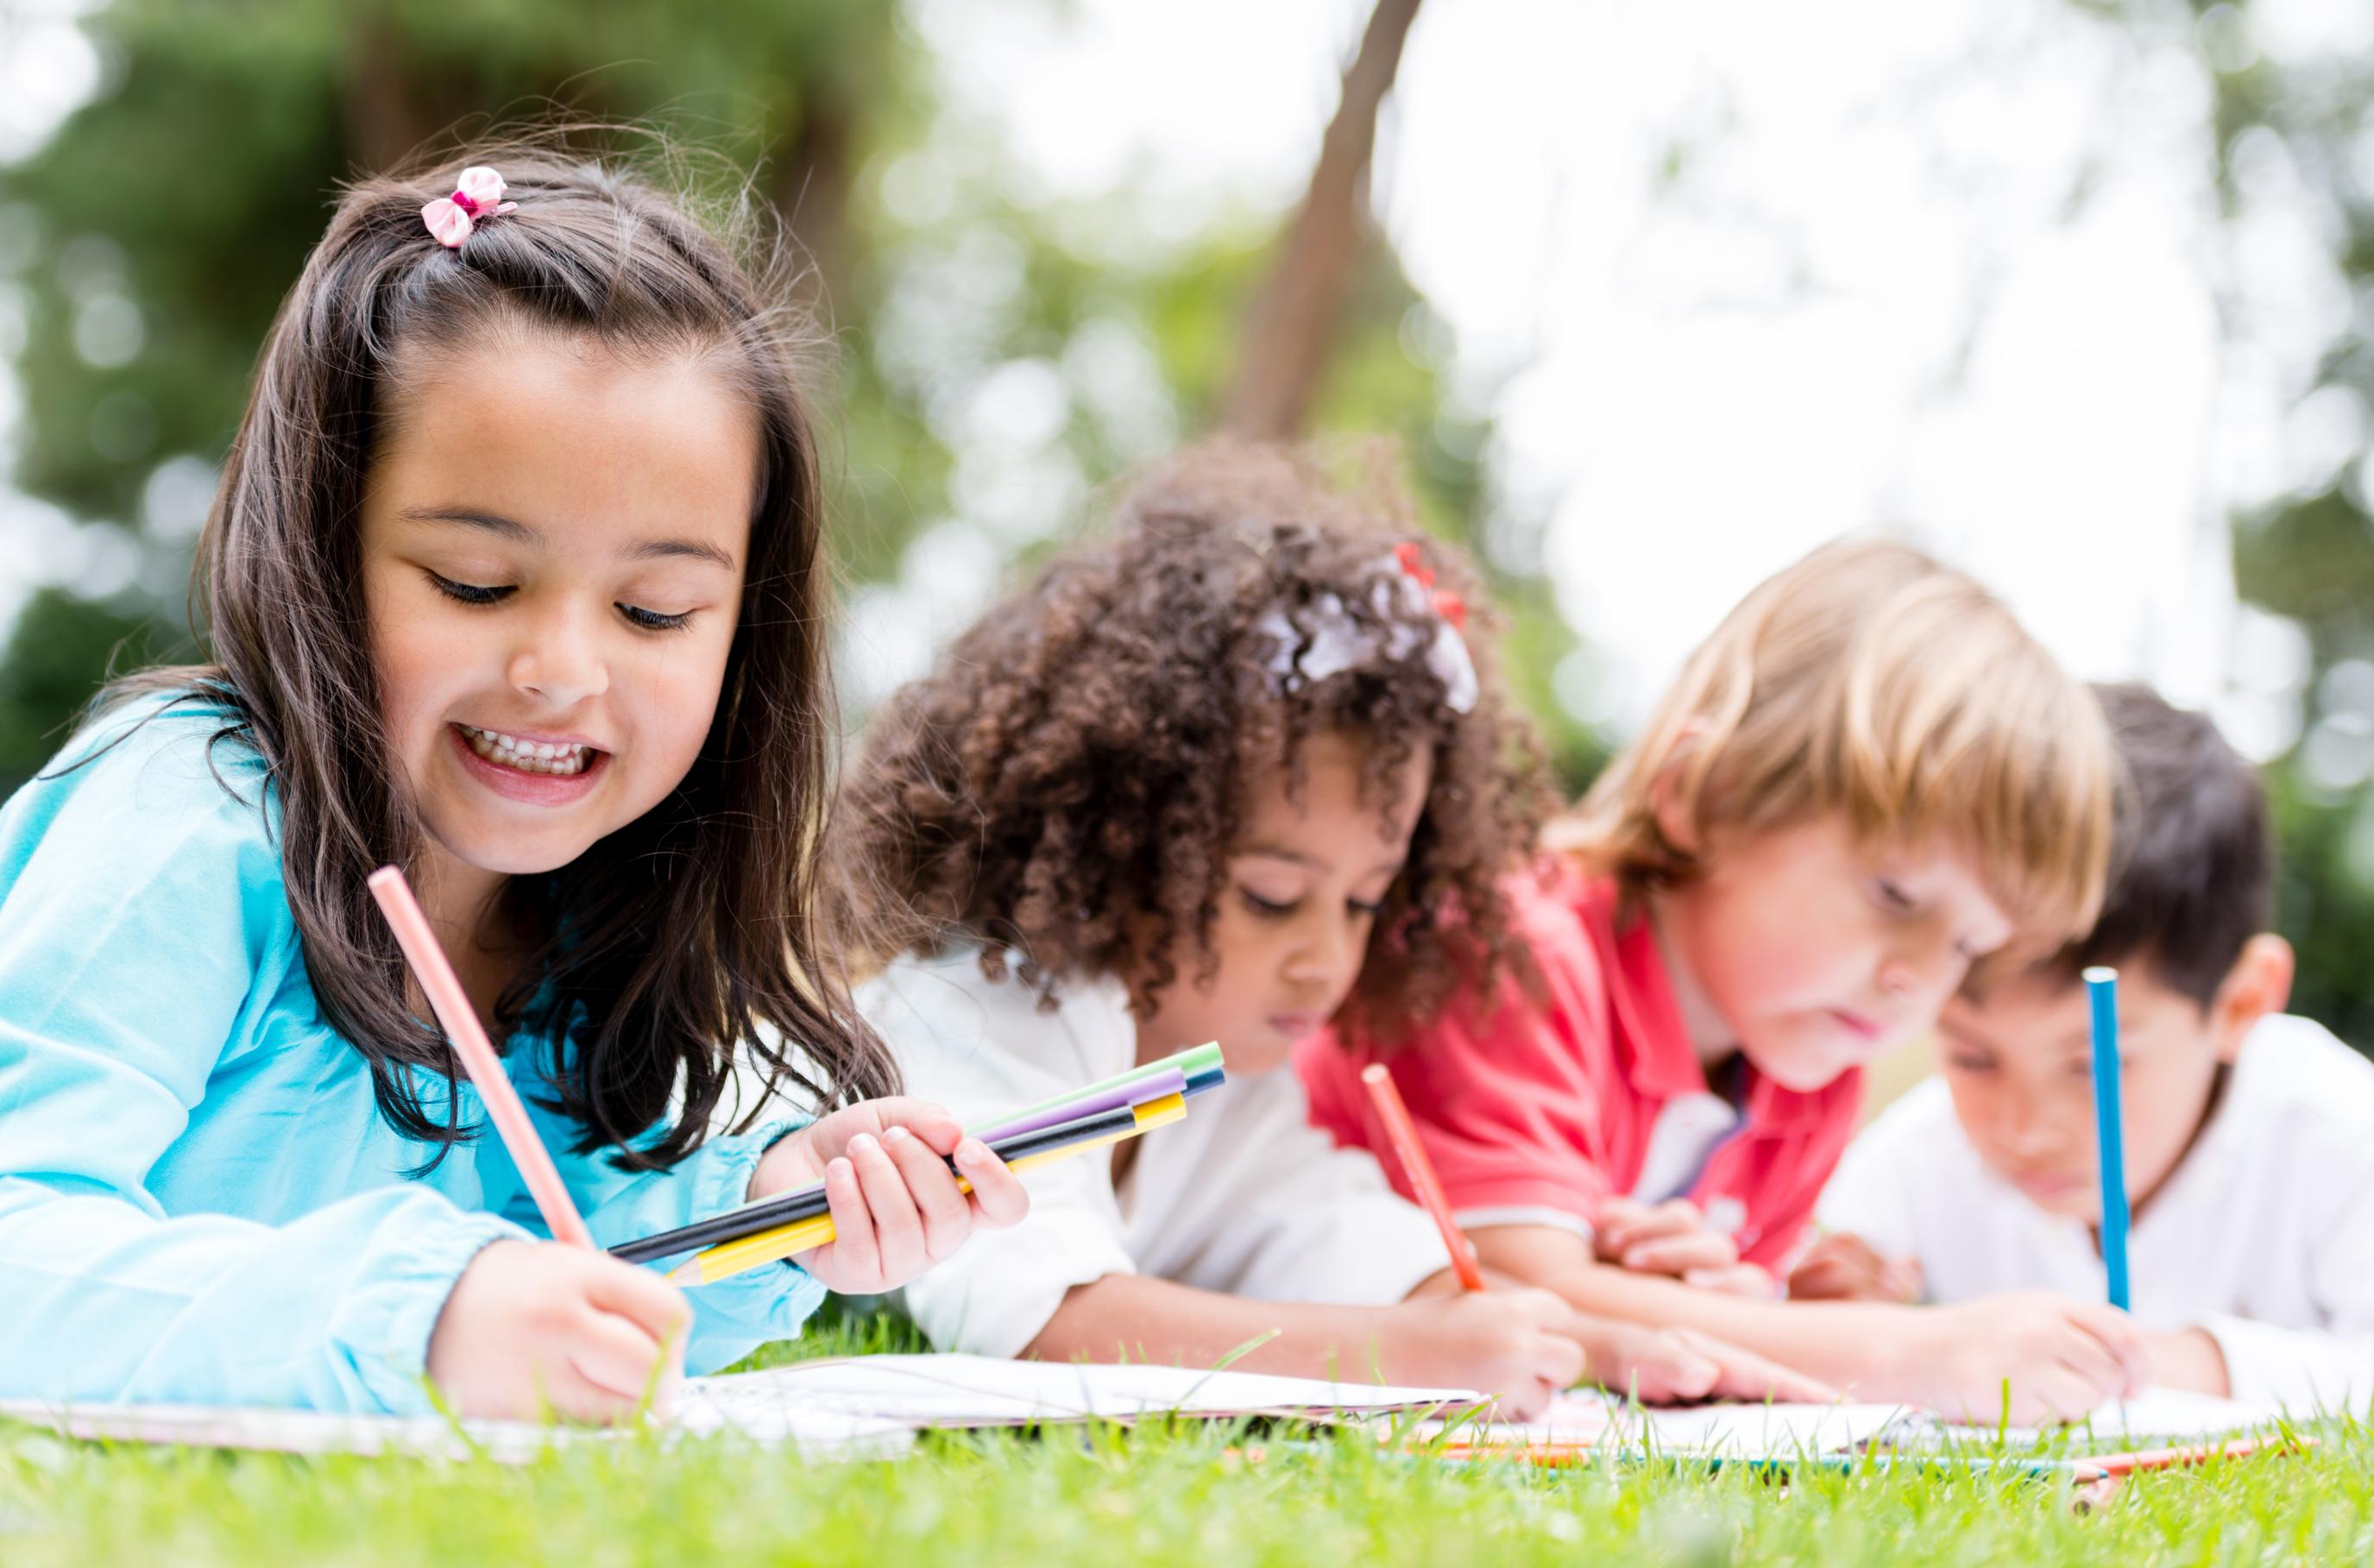 School kids having fun on the grass painting on books.